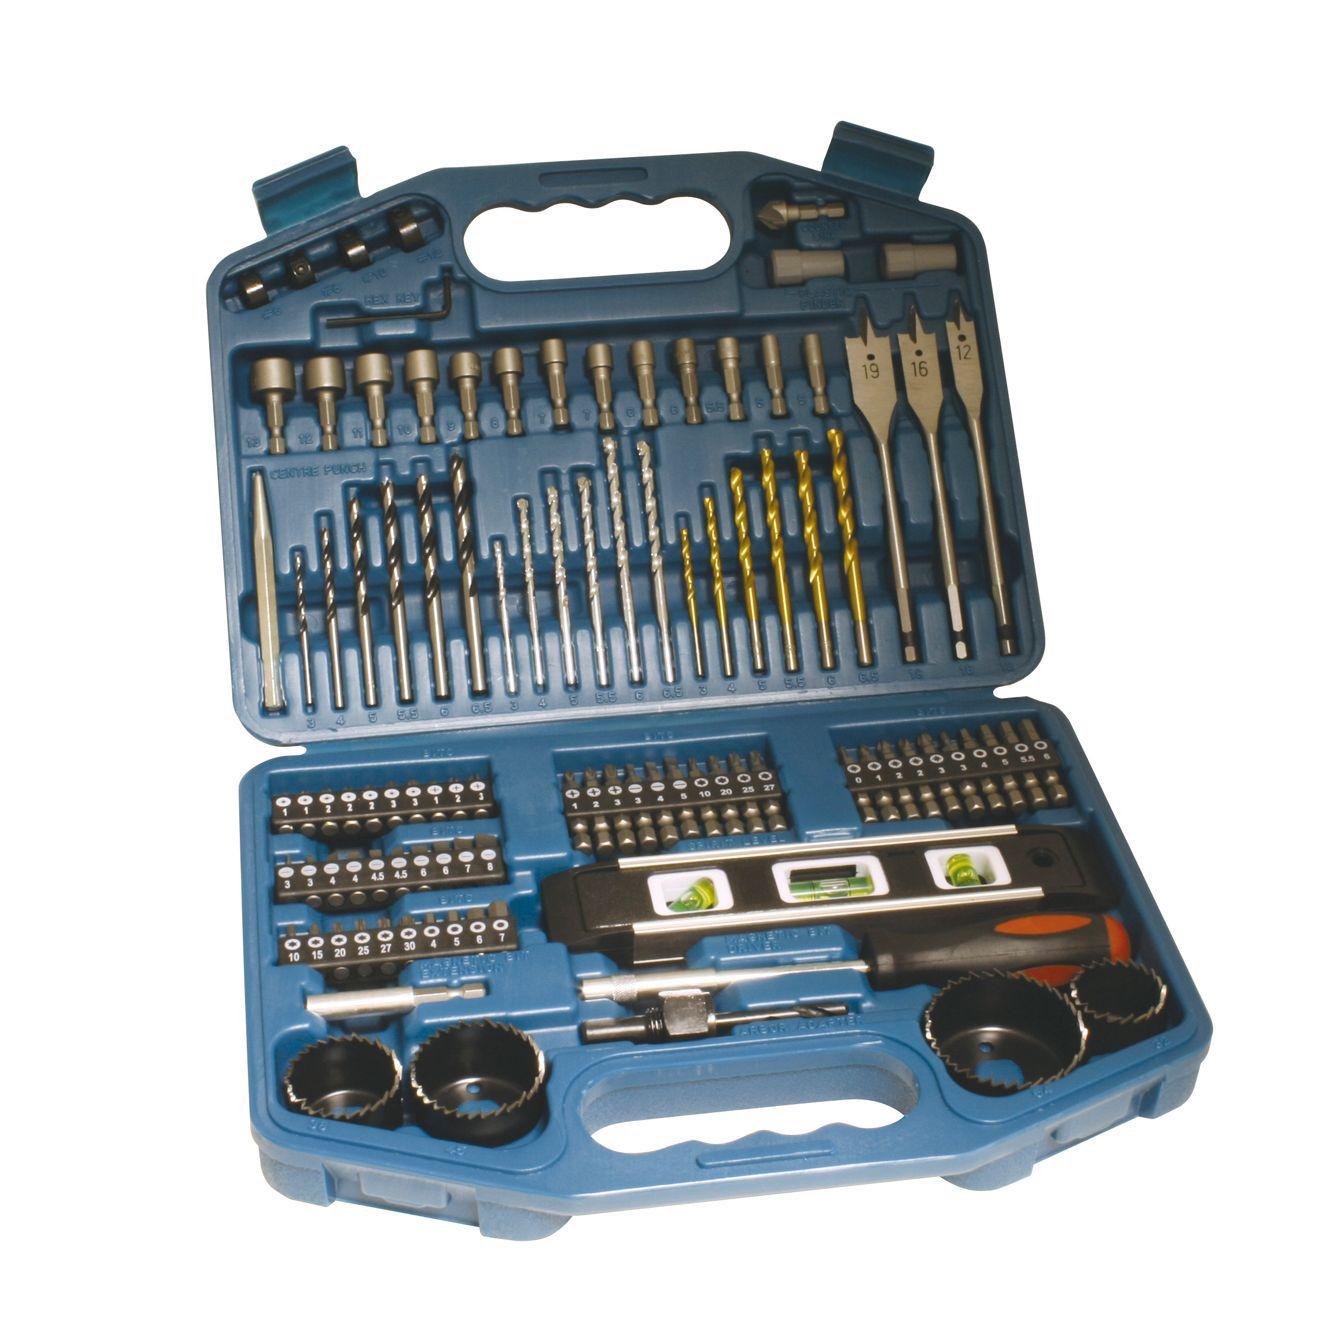 garage power tool storage ideas - Makita 3 6 5 mm Accessory Set 101 Pieces 101